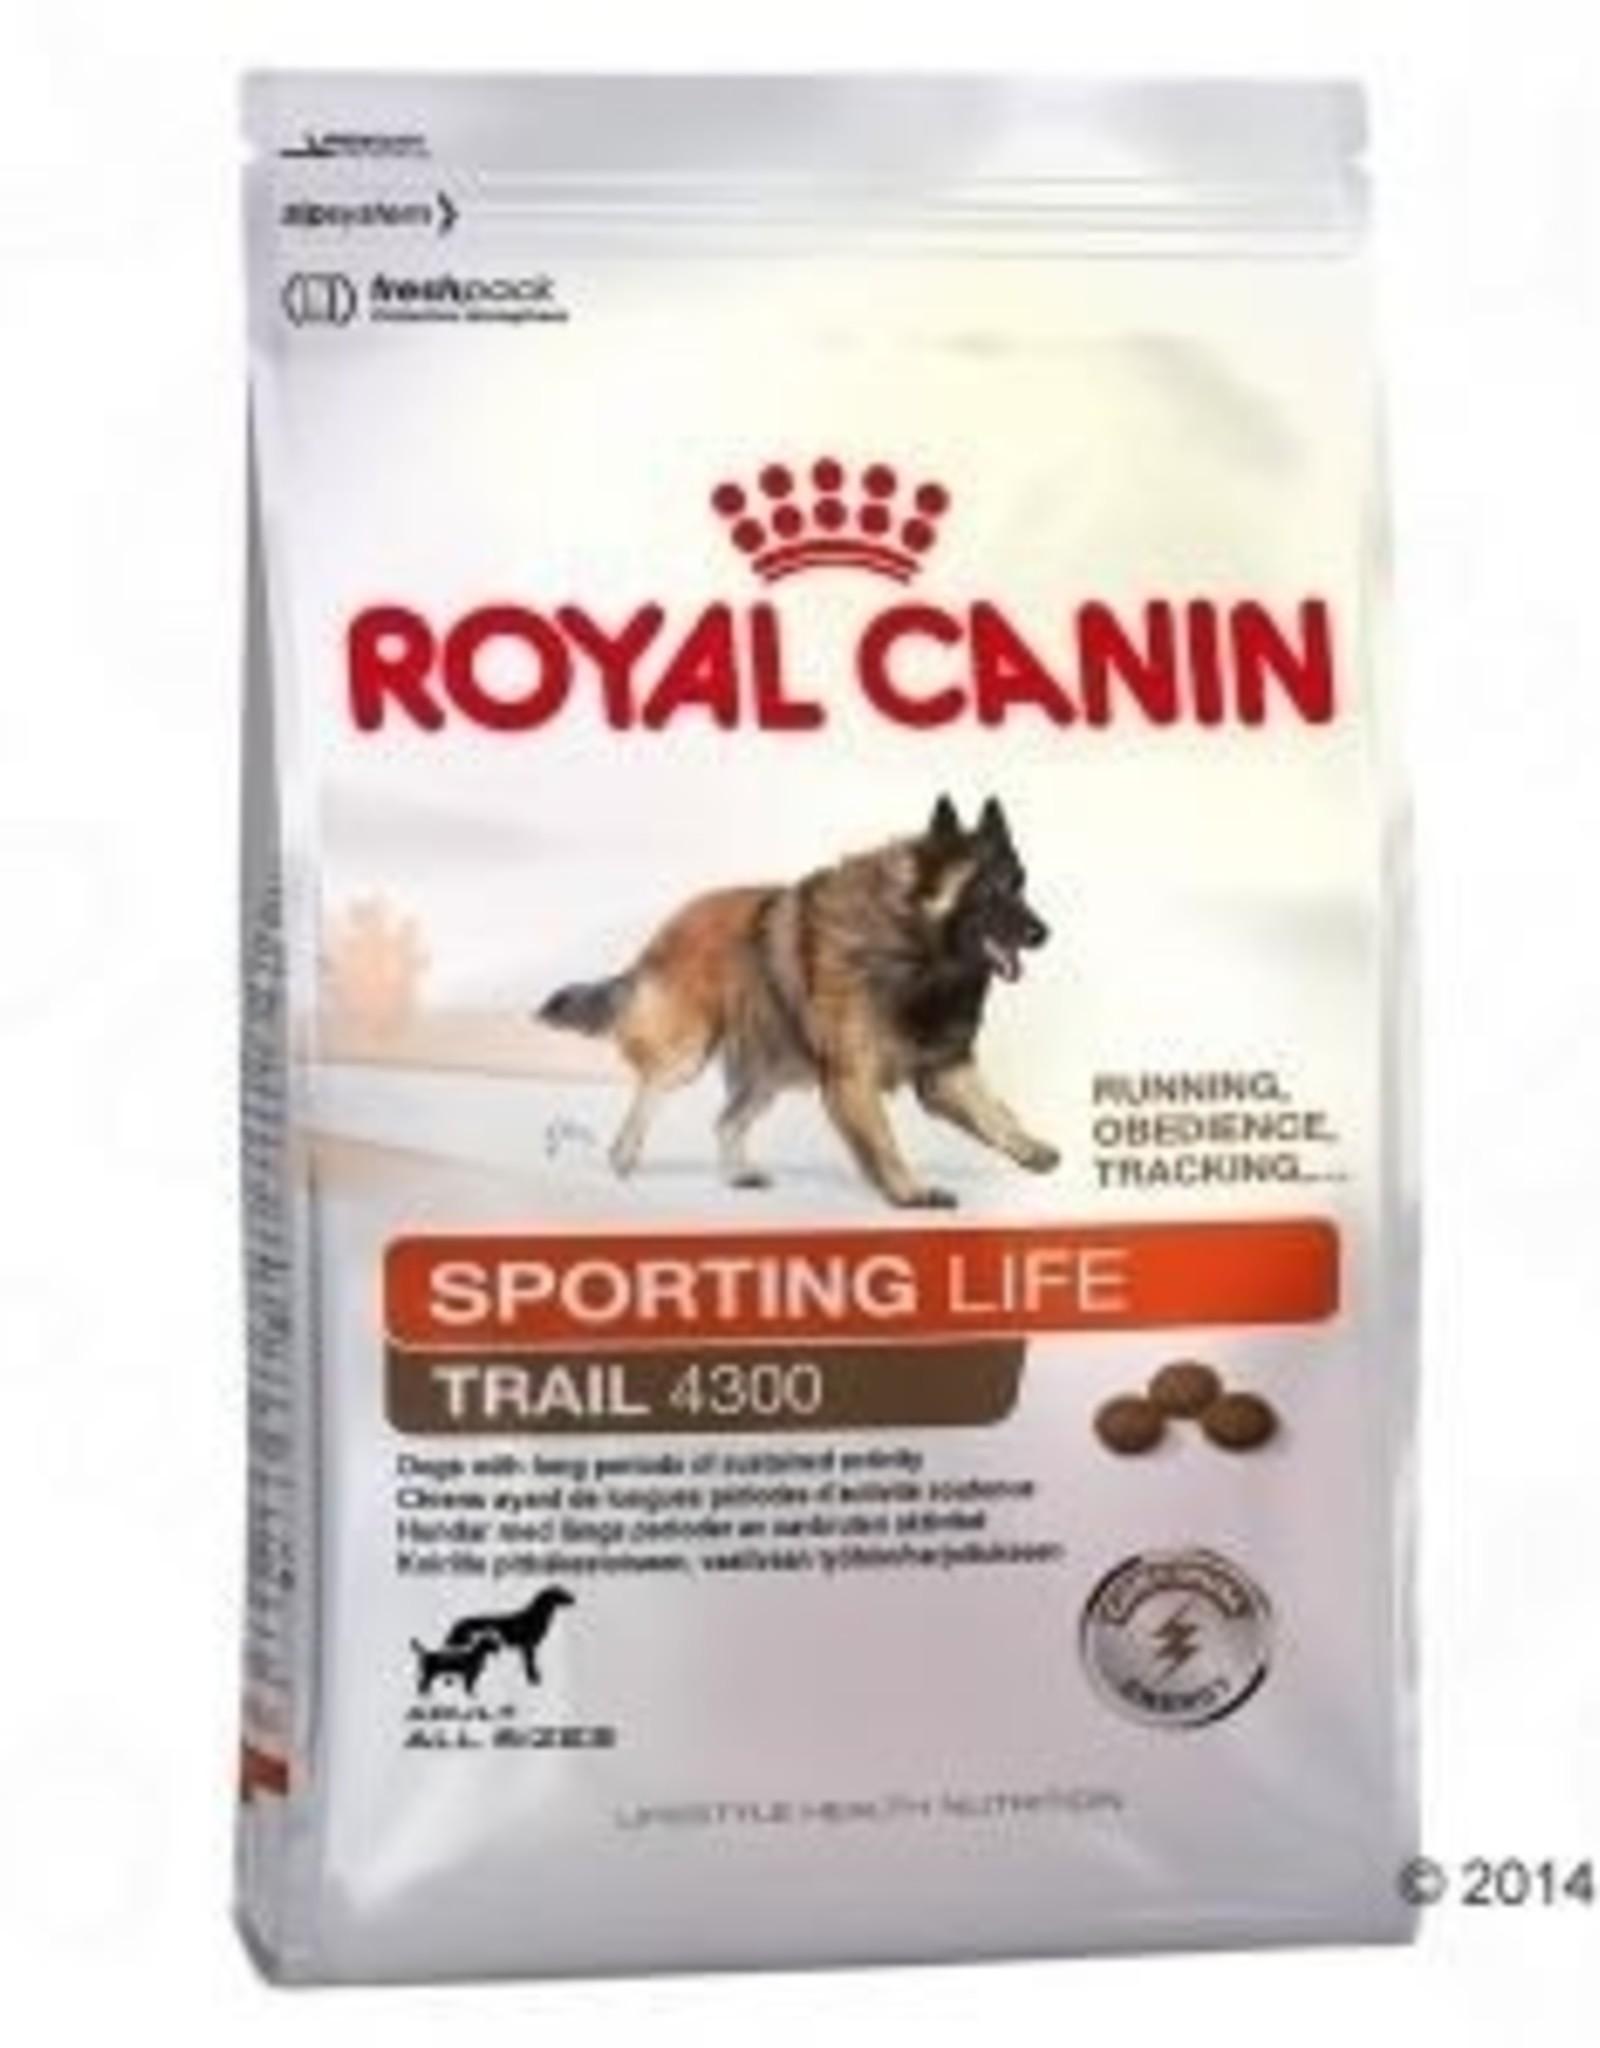 Royal Canin Royal Canin Uls Sporting Life Trail 4300 15kg